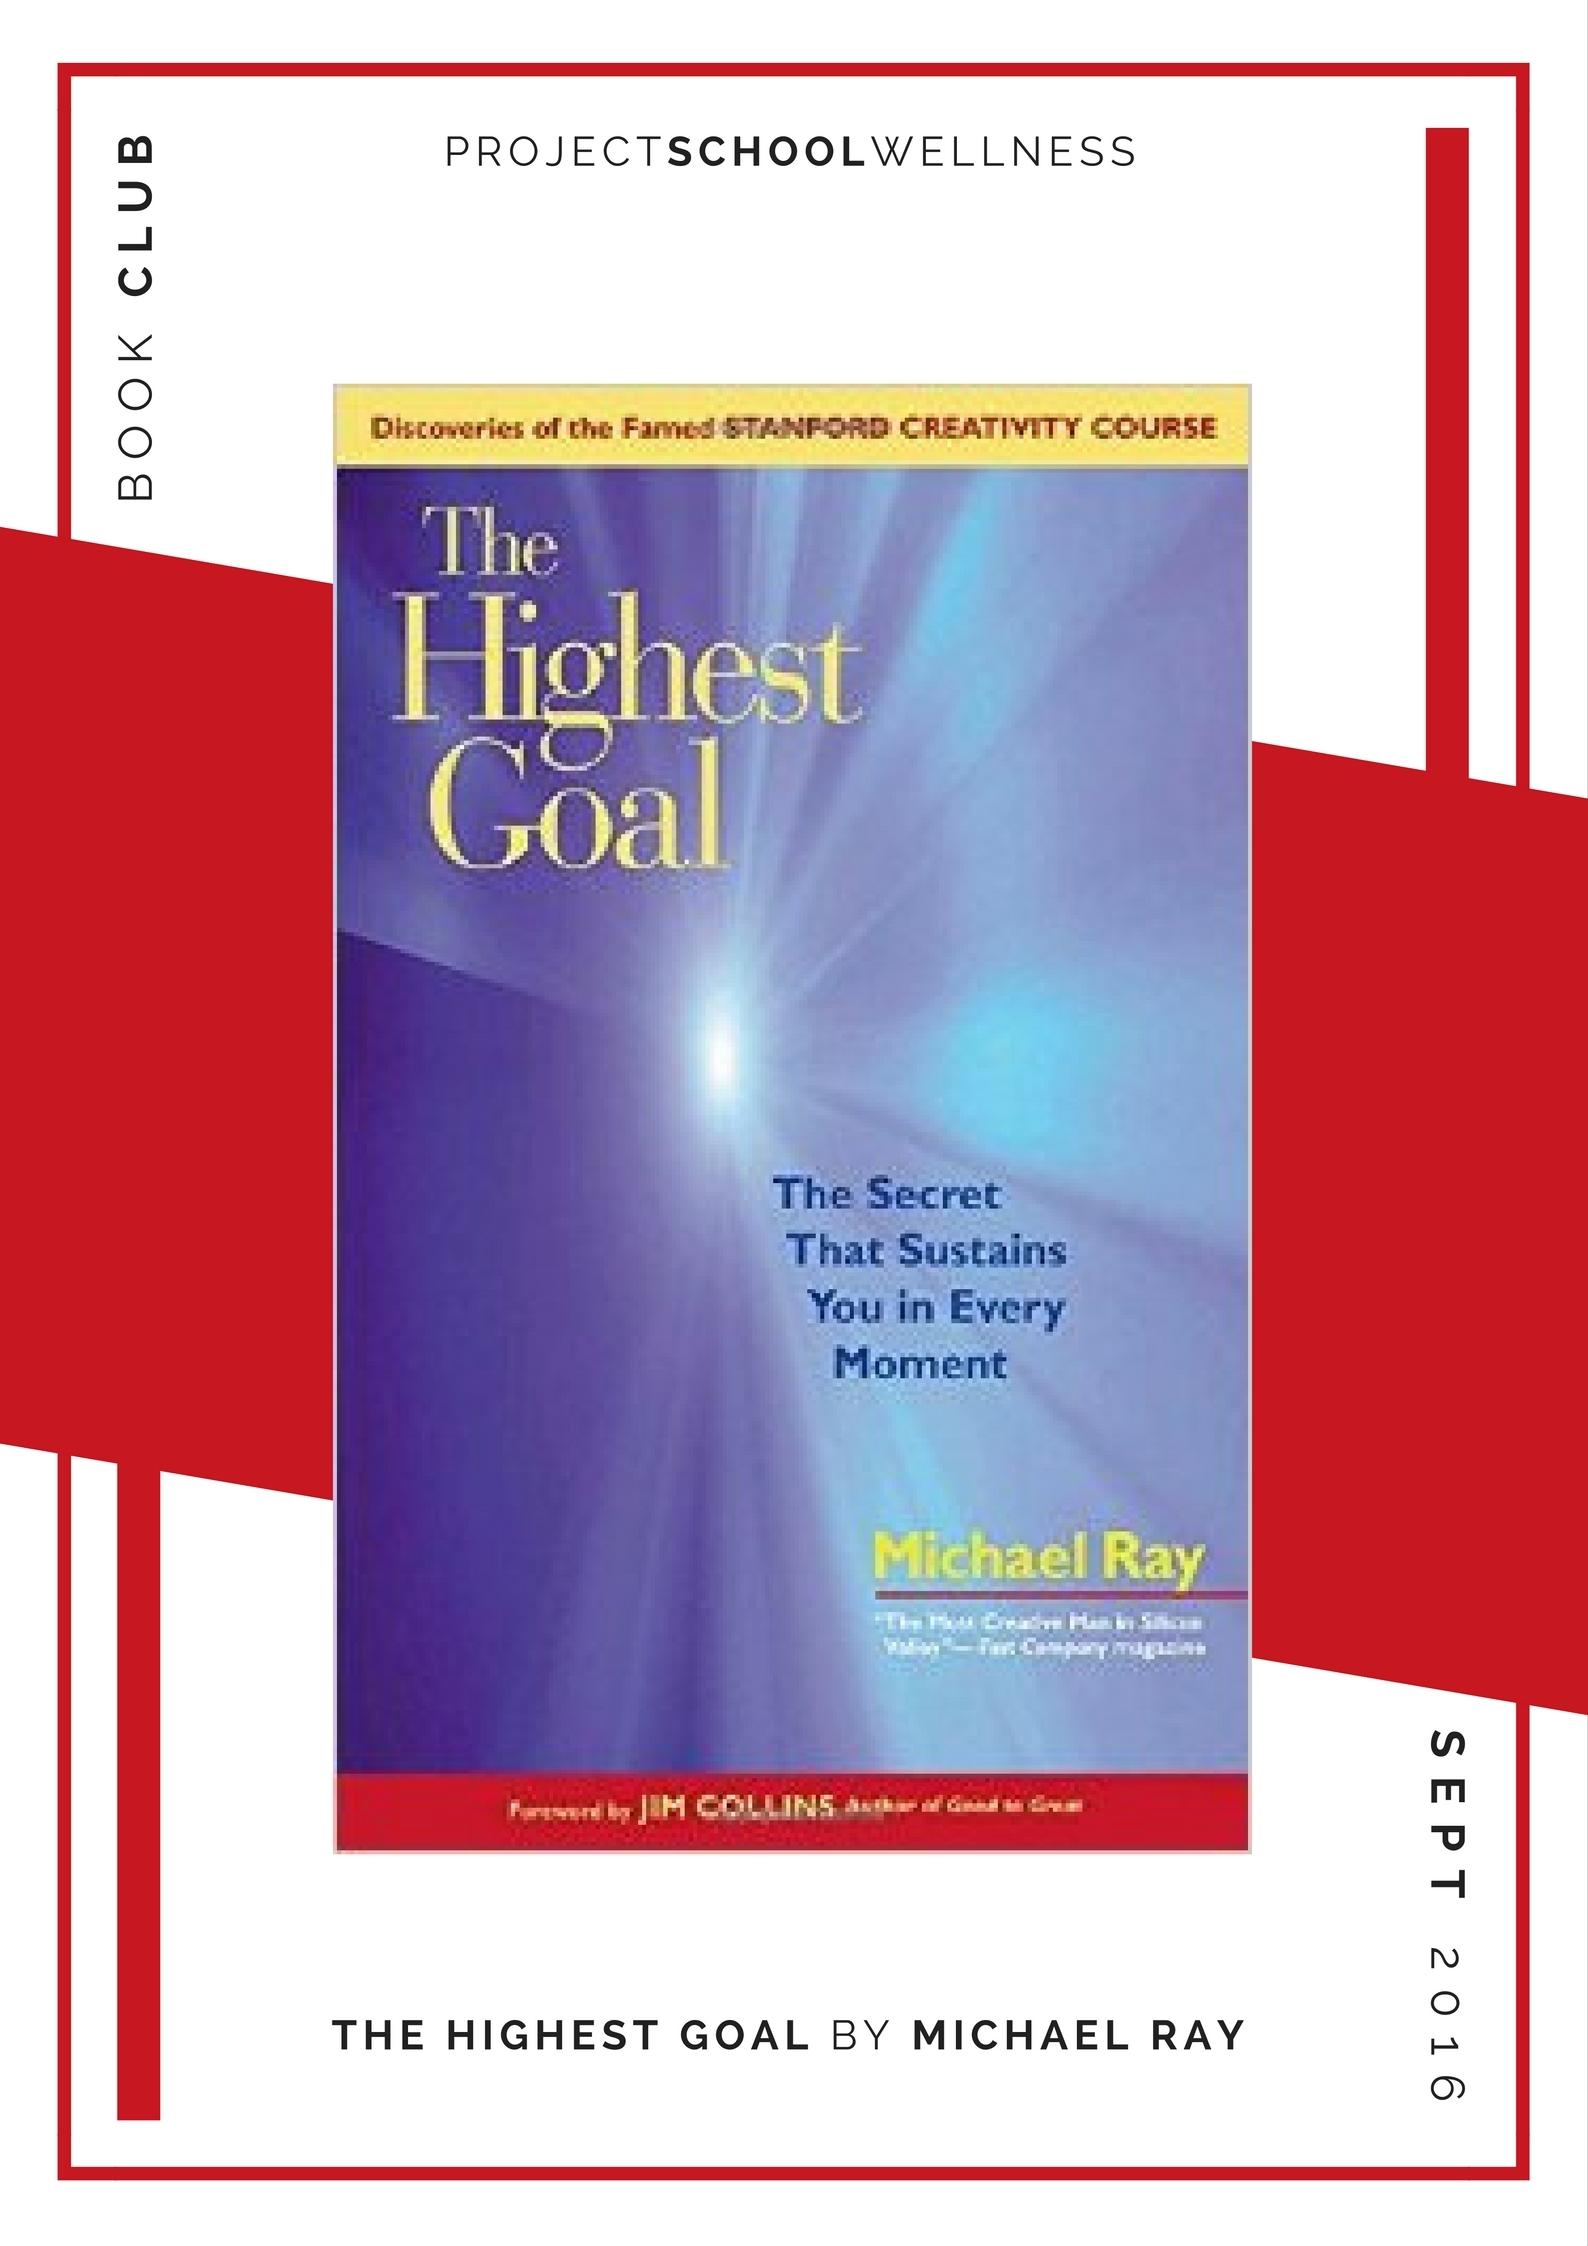 Michael Ray, The Highest Goal - Project School Wellness' Teacher Book Club, must read books for every teacher!